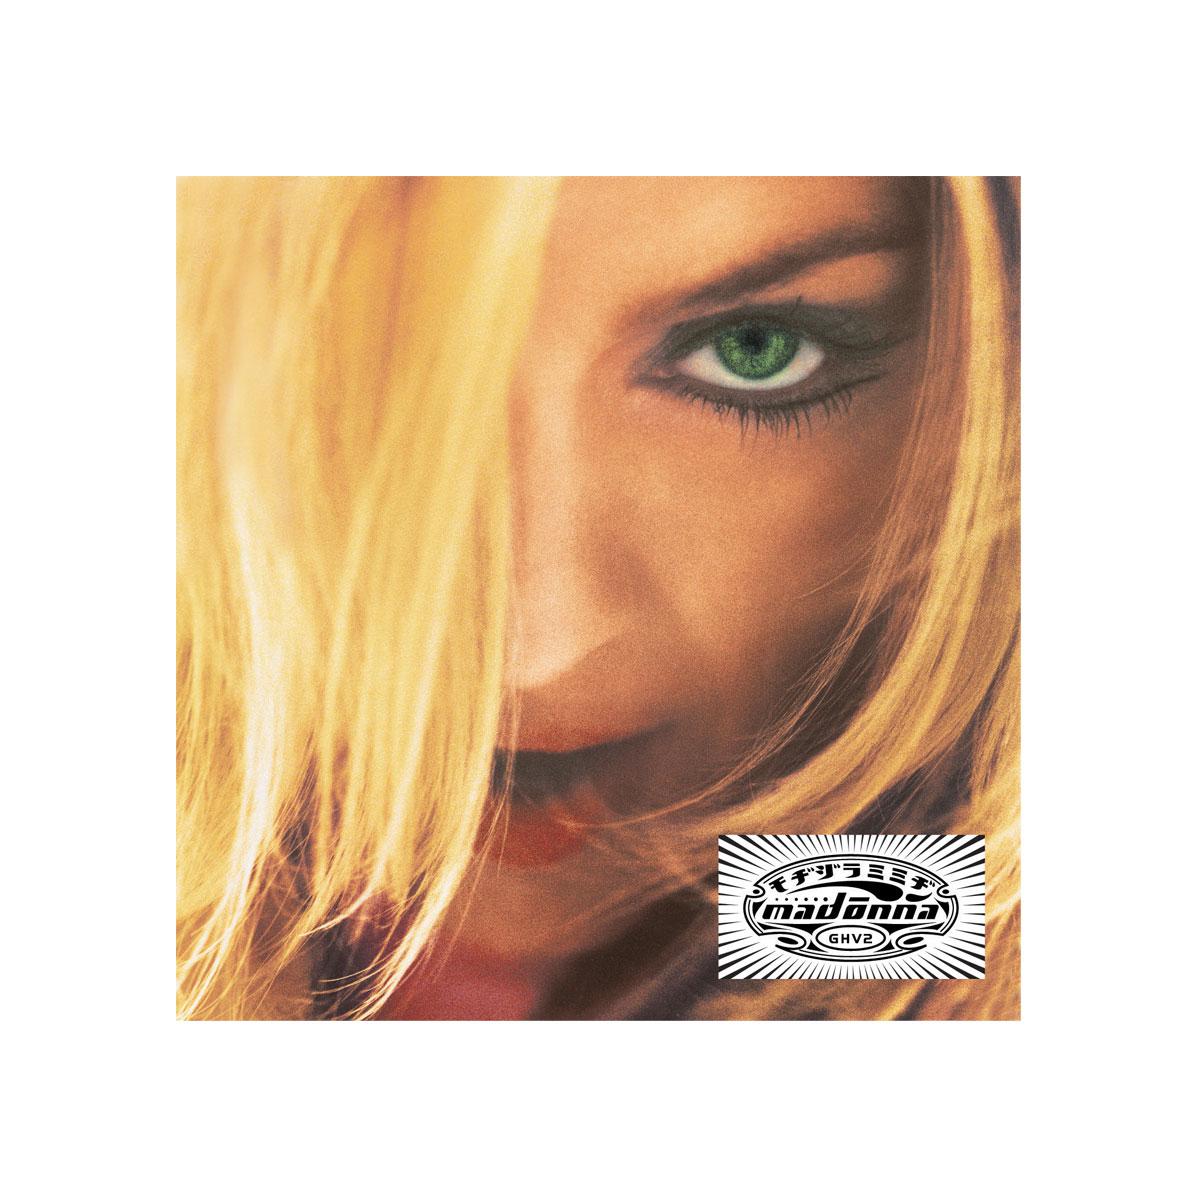 CD Madonna Greatest Hits Vol. 2